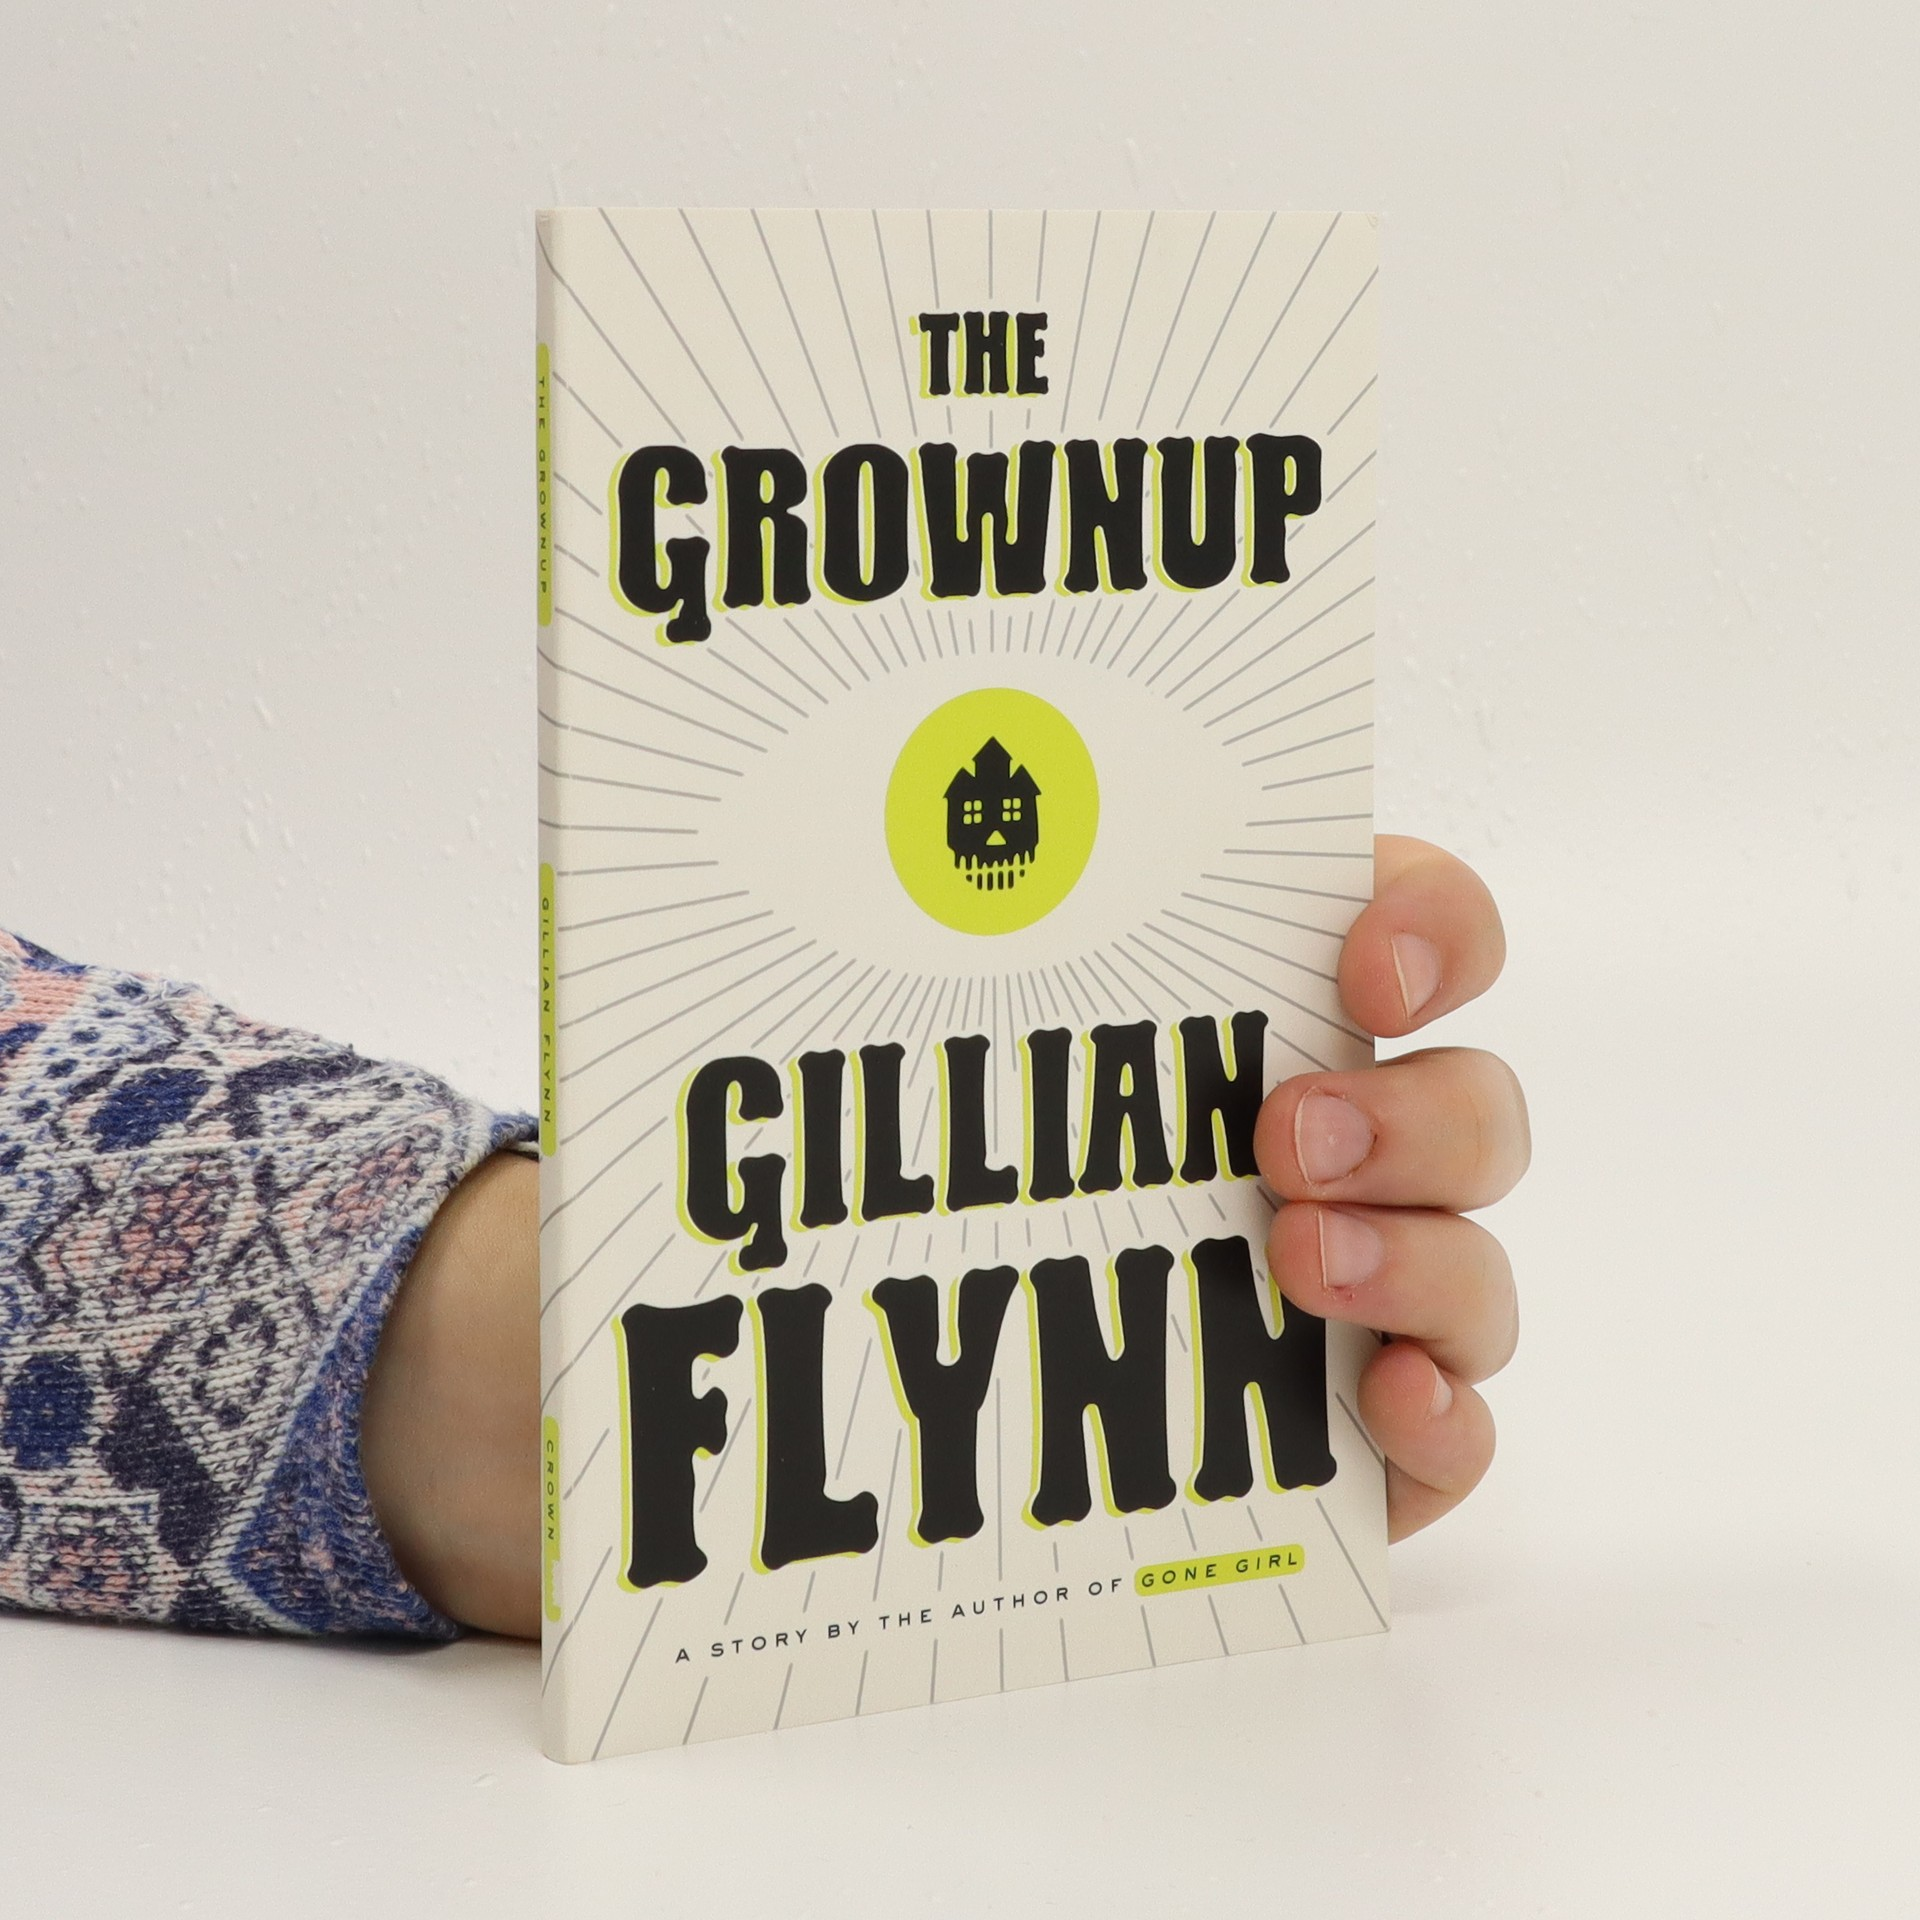 antikvární kniha The Grownup, 2014